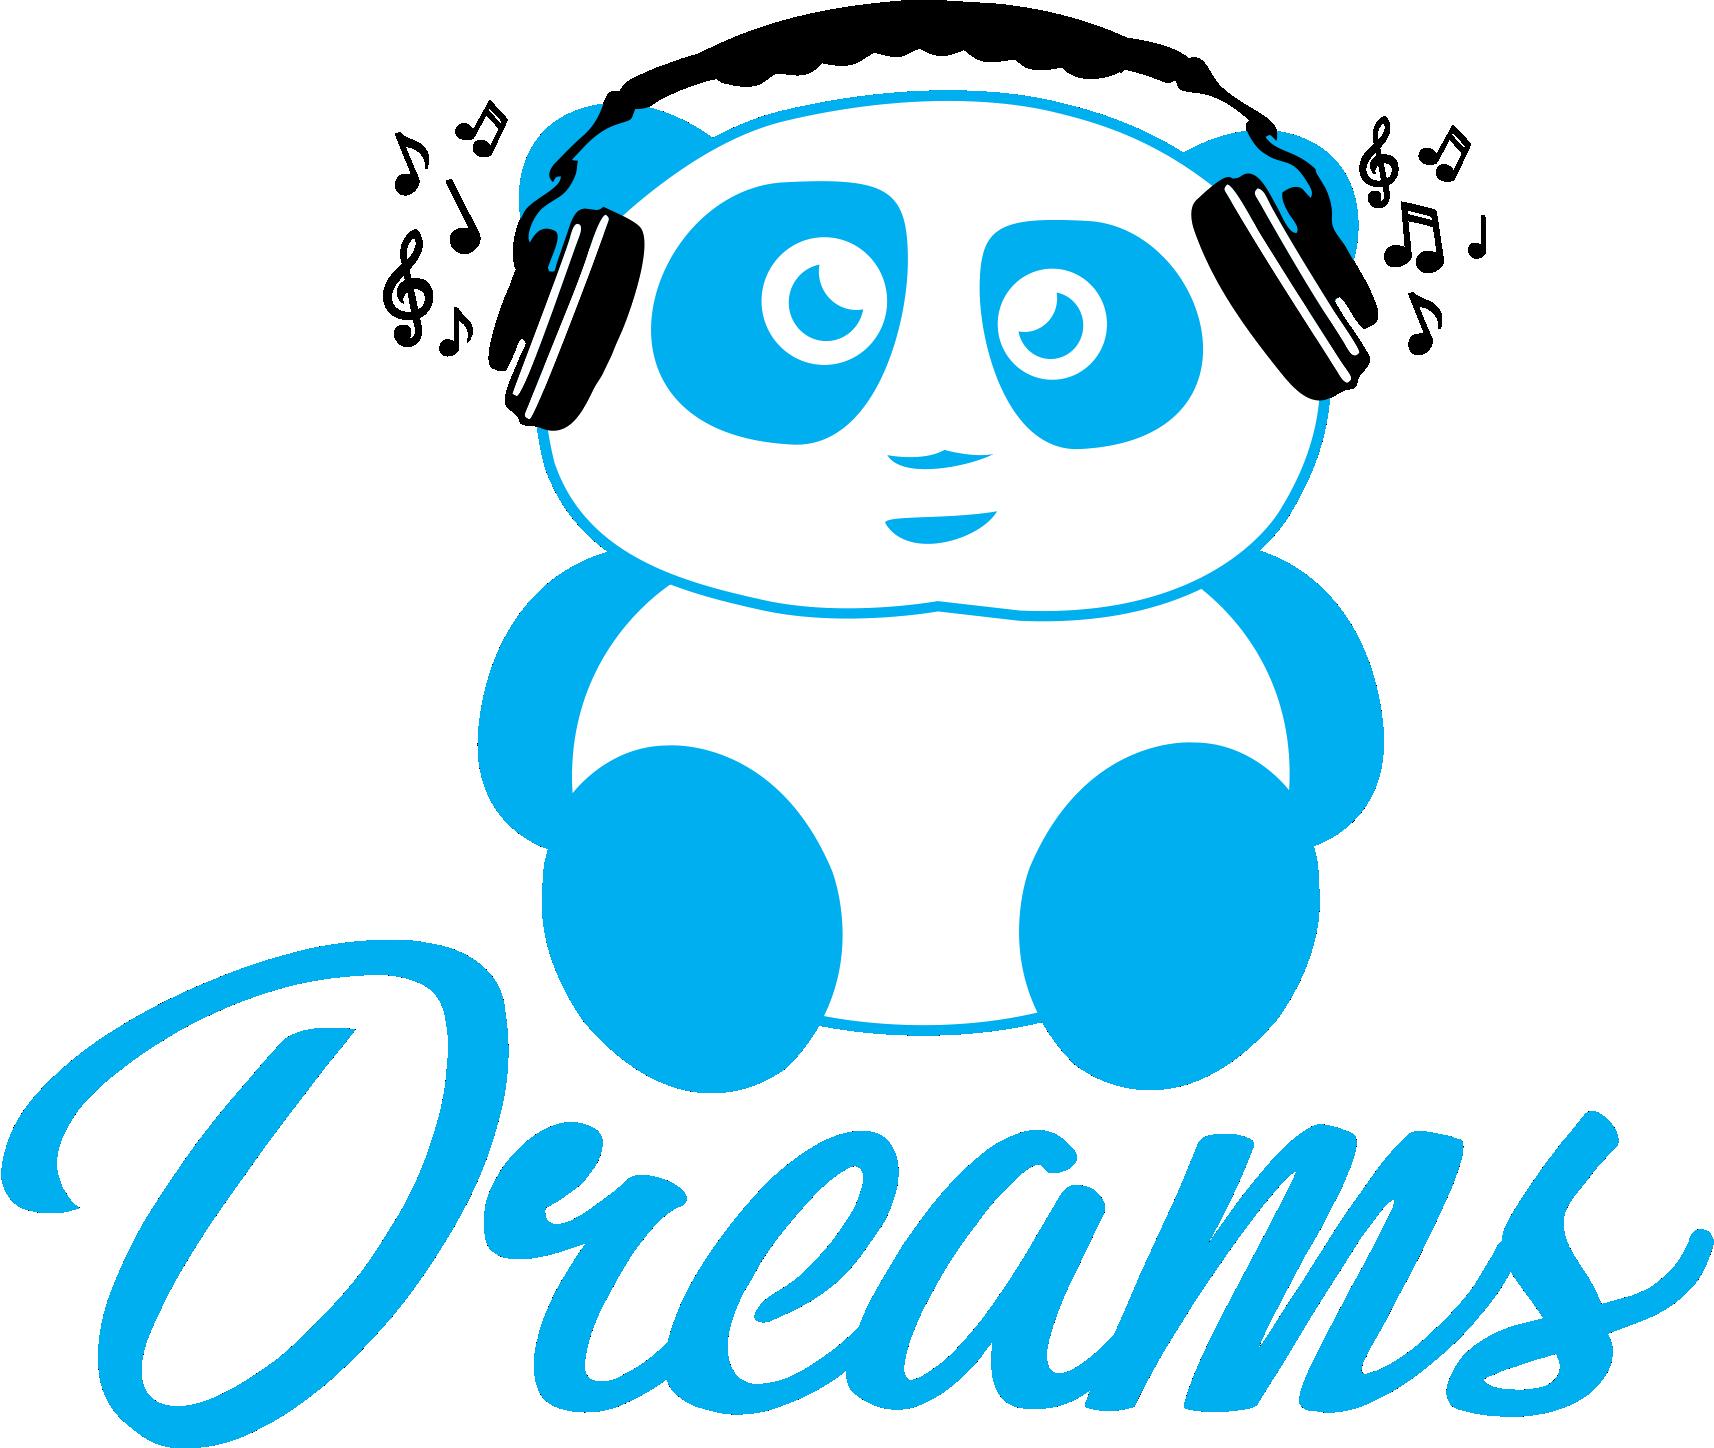 Headphones clipart listening post. Dreams music launches merchandise